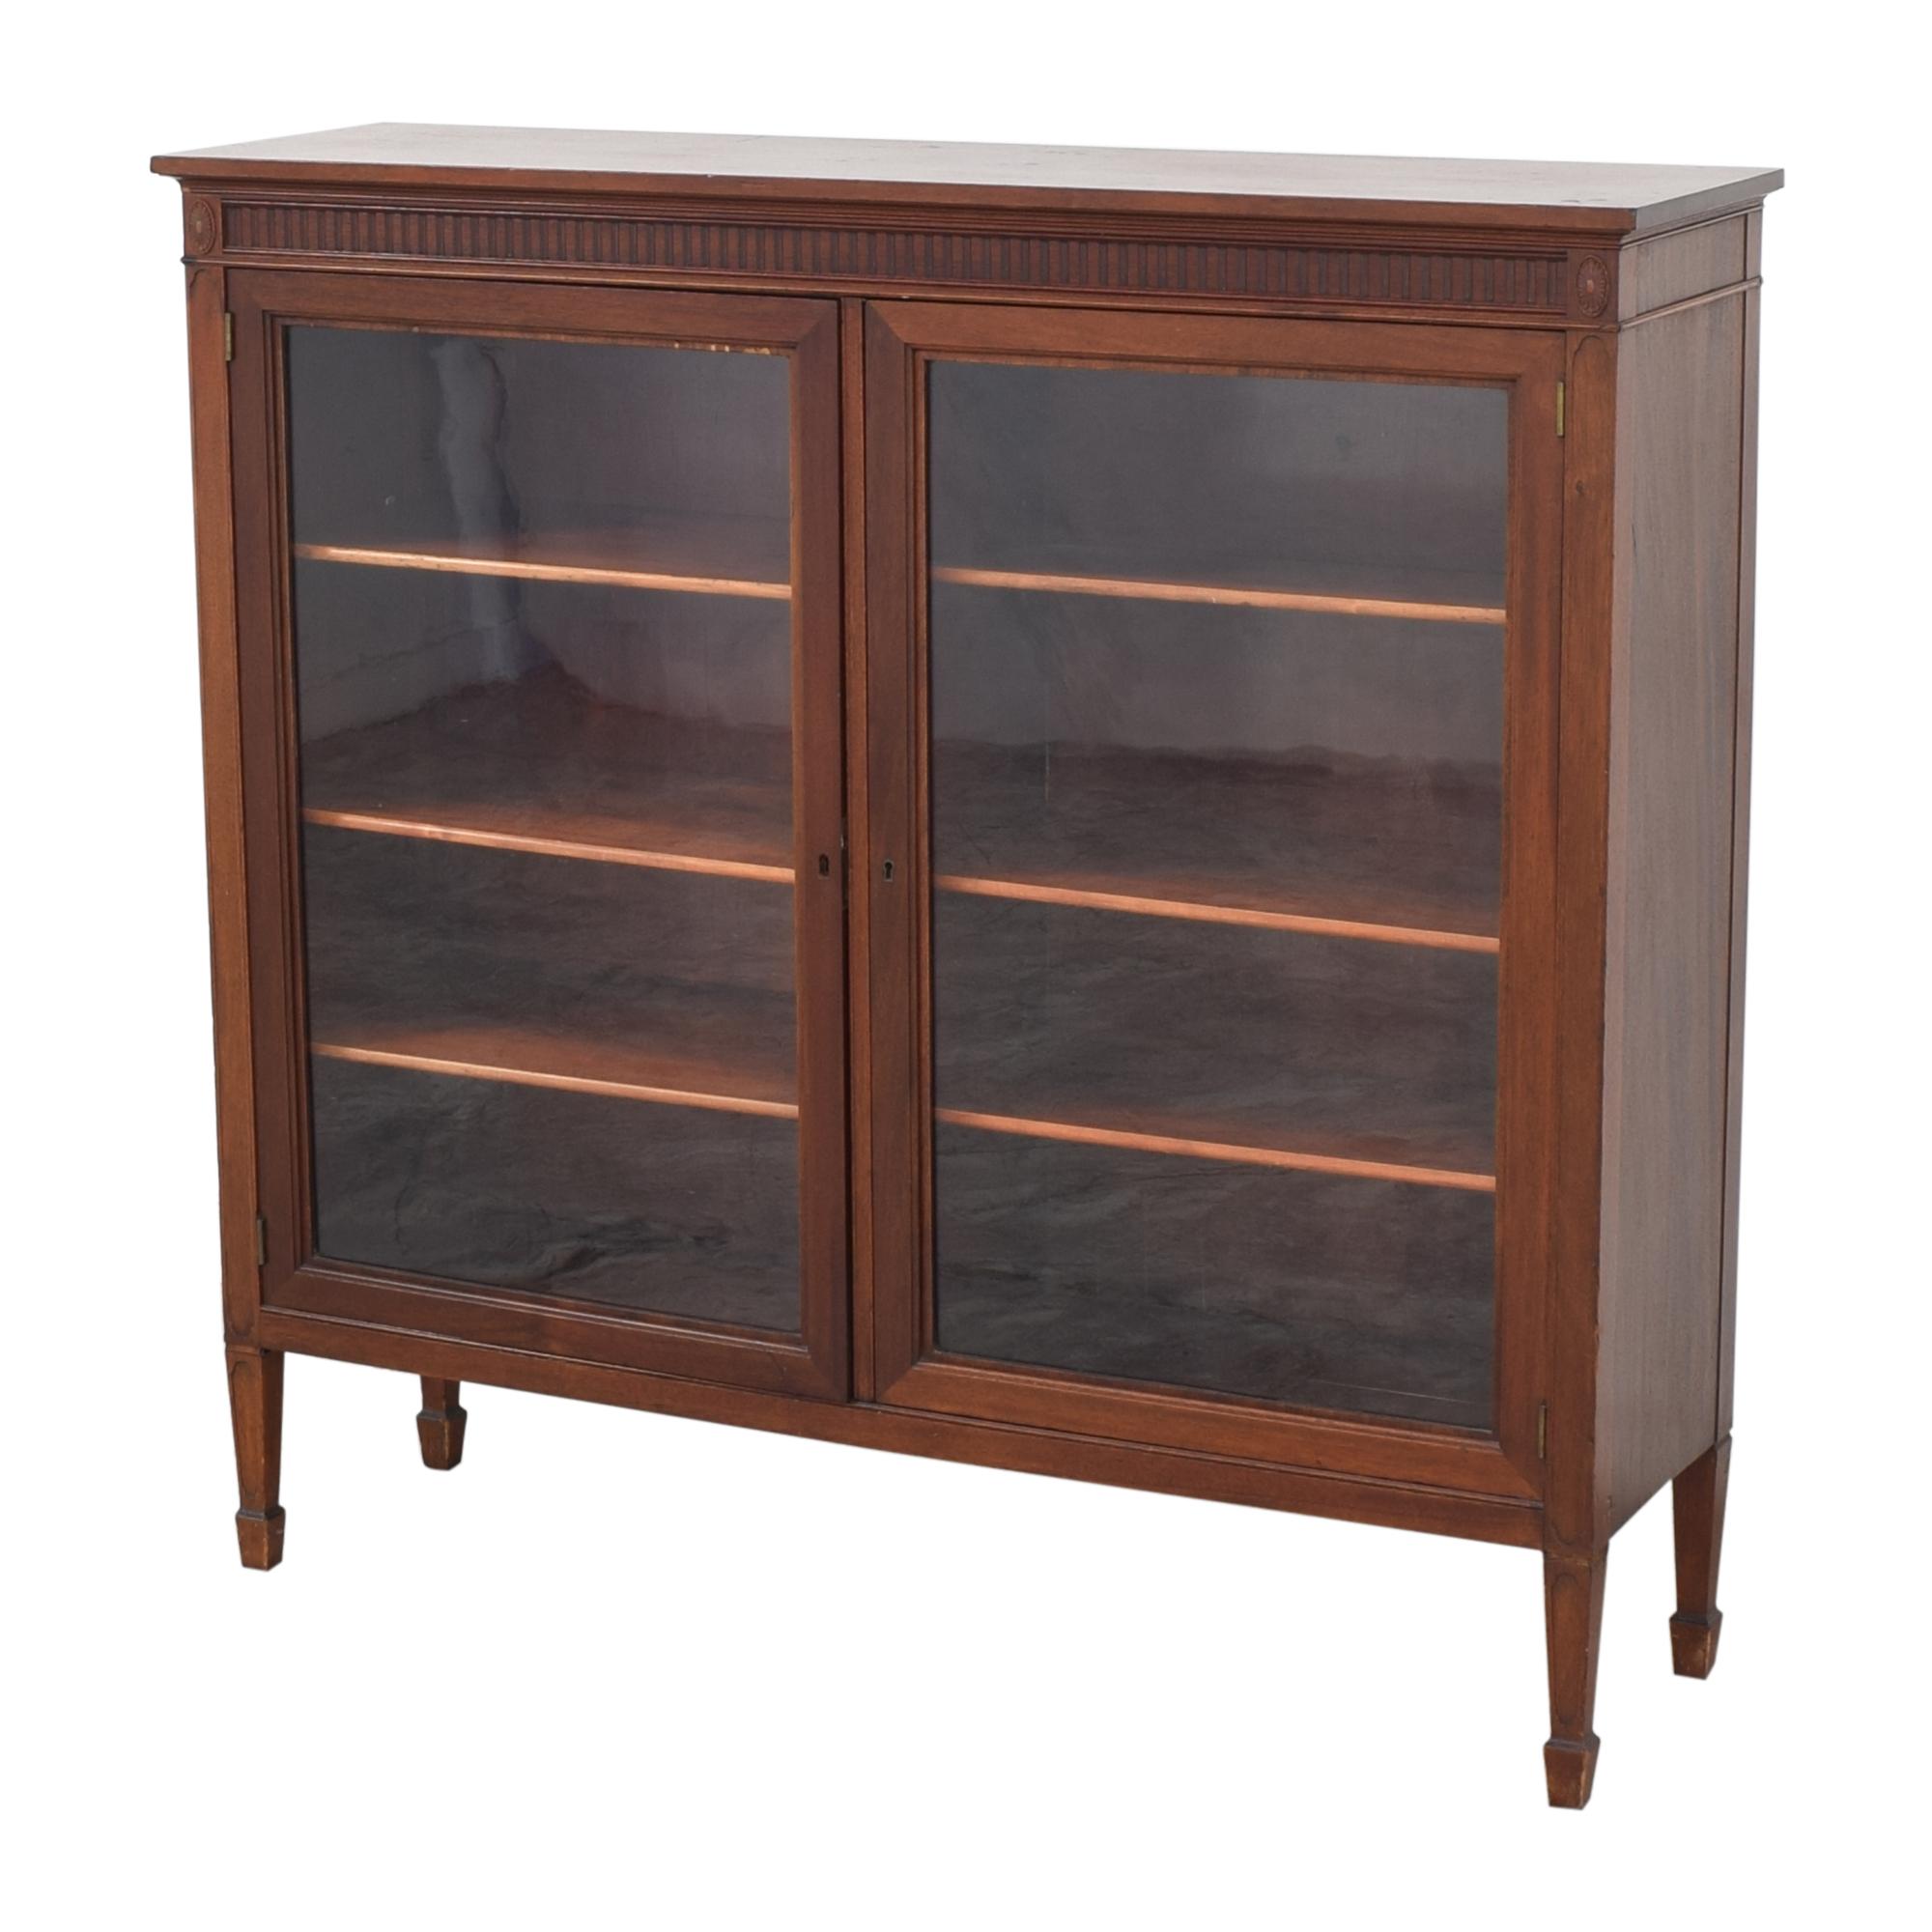 Double Door Curio Cabinet used